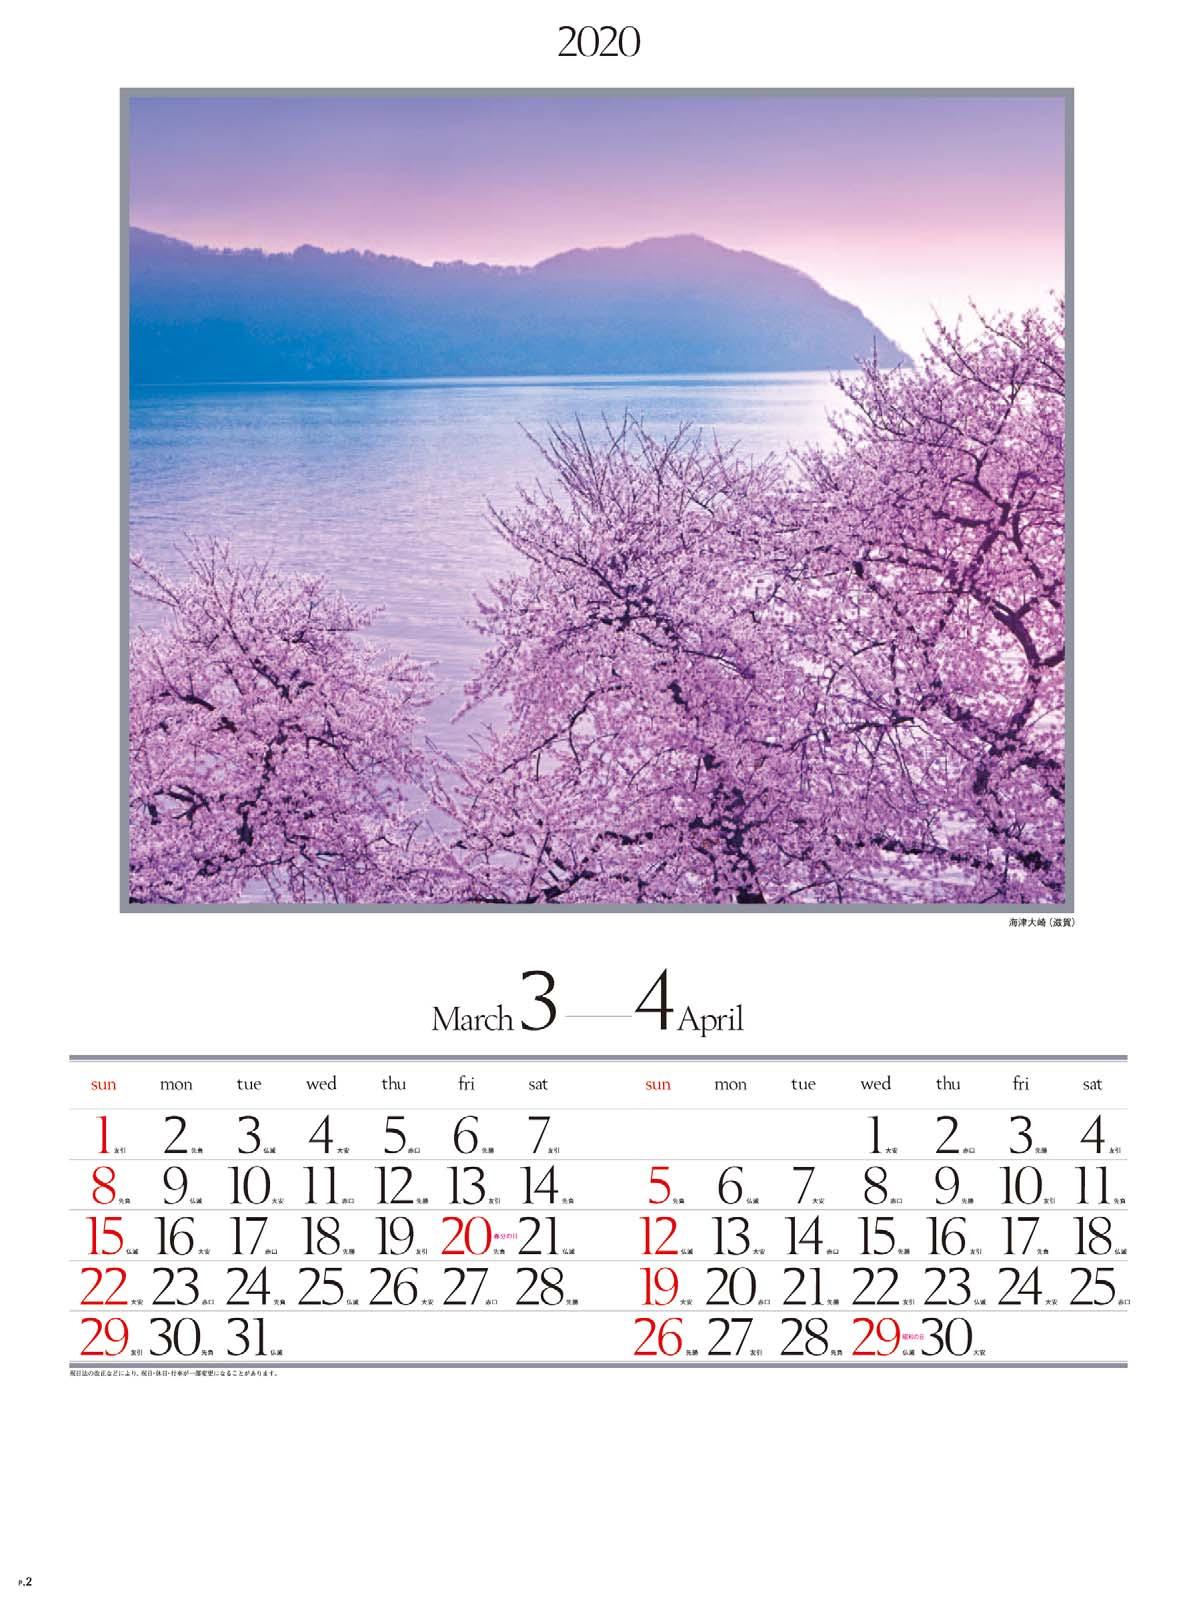 画像:海津大崎(滋賀) 四季六彩 2020年カレンダー